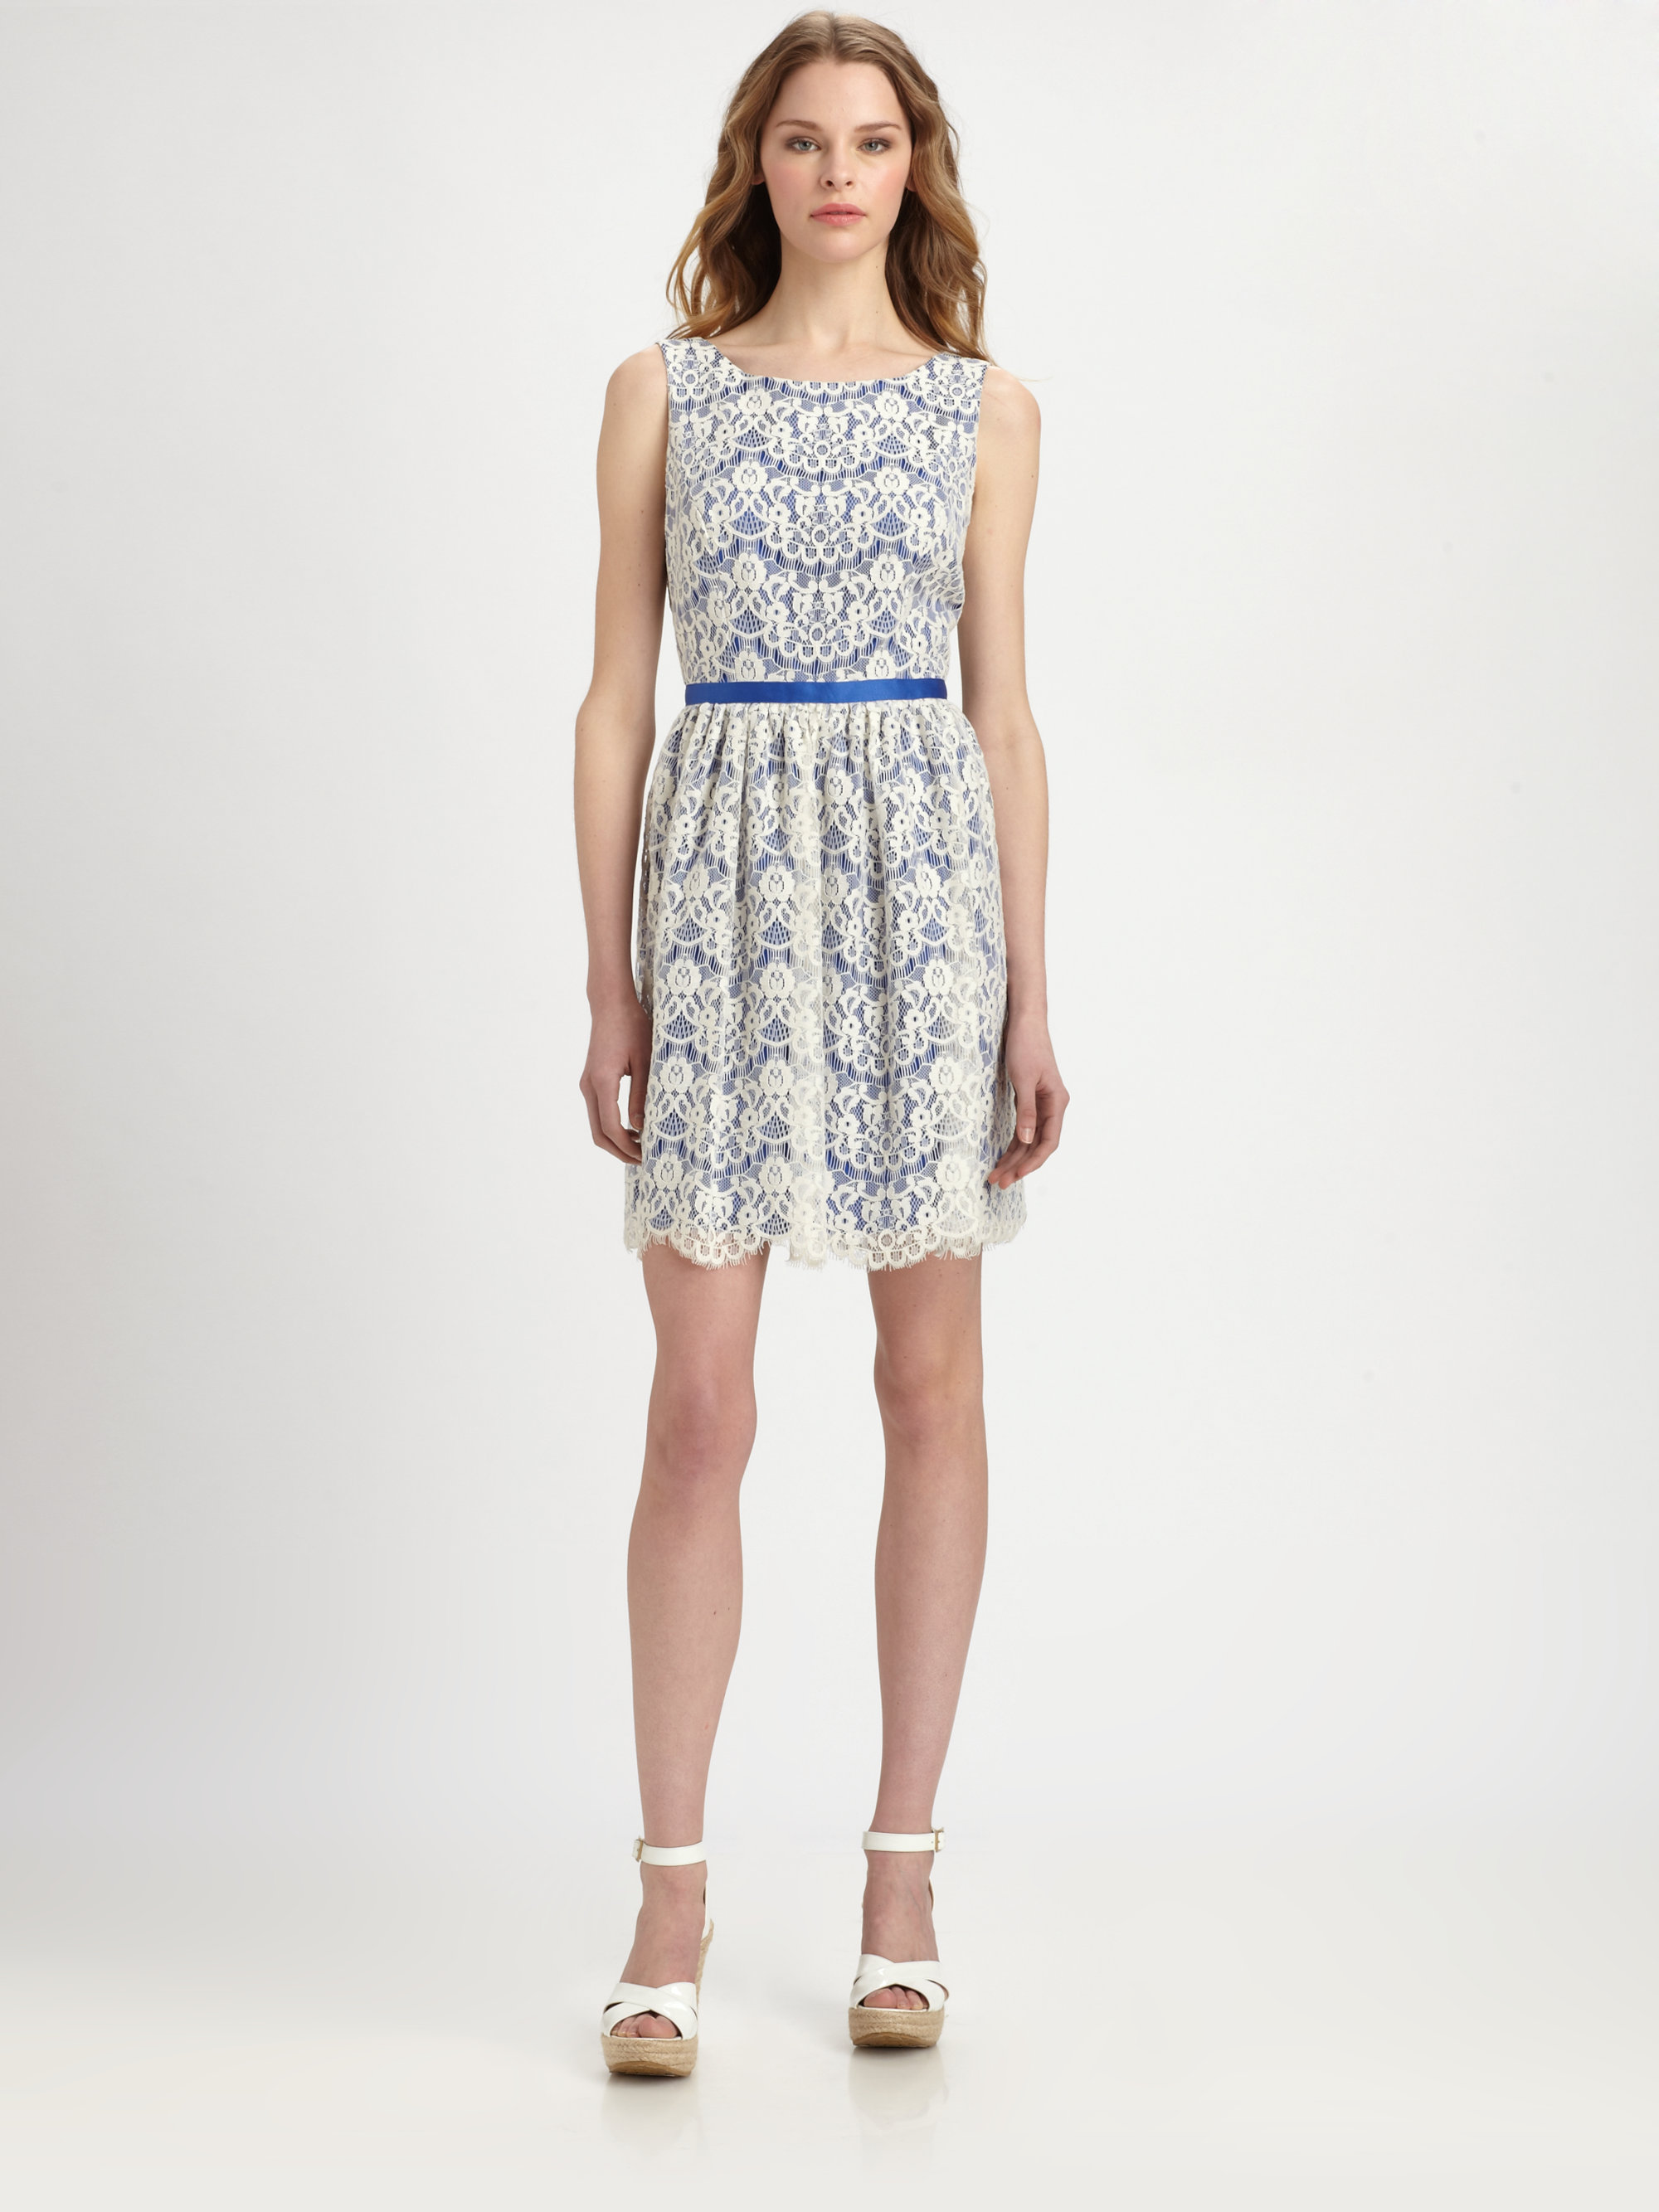 5c22f3415f5 Lyst - Shoshanna June Lace Dress in Blue